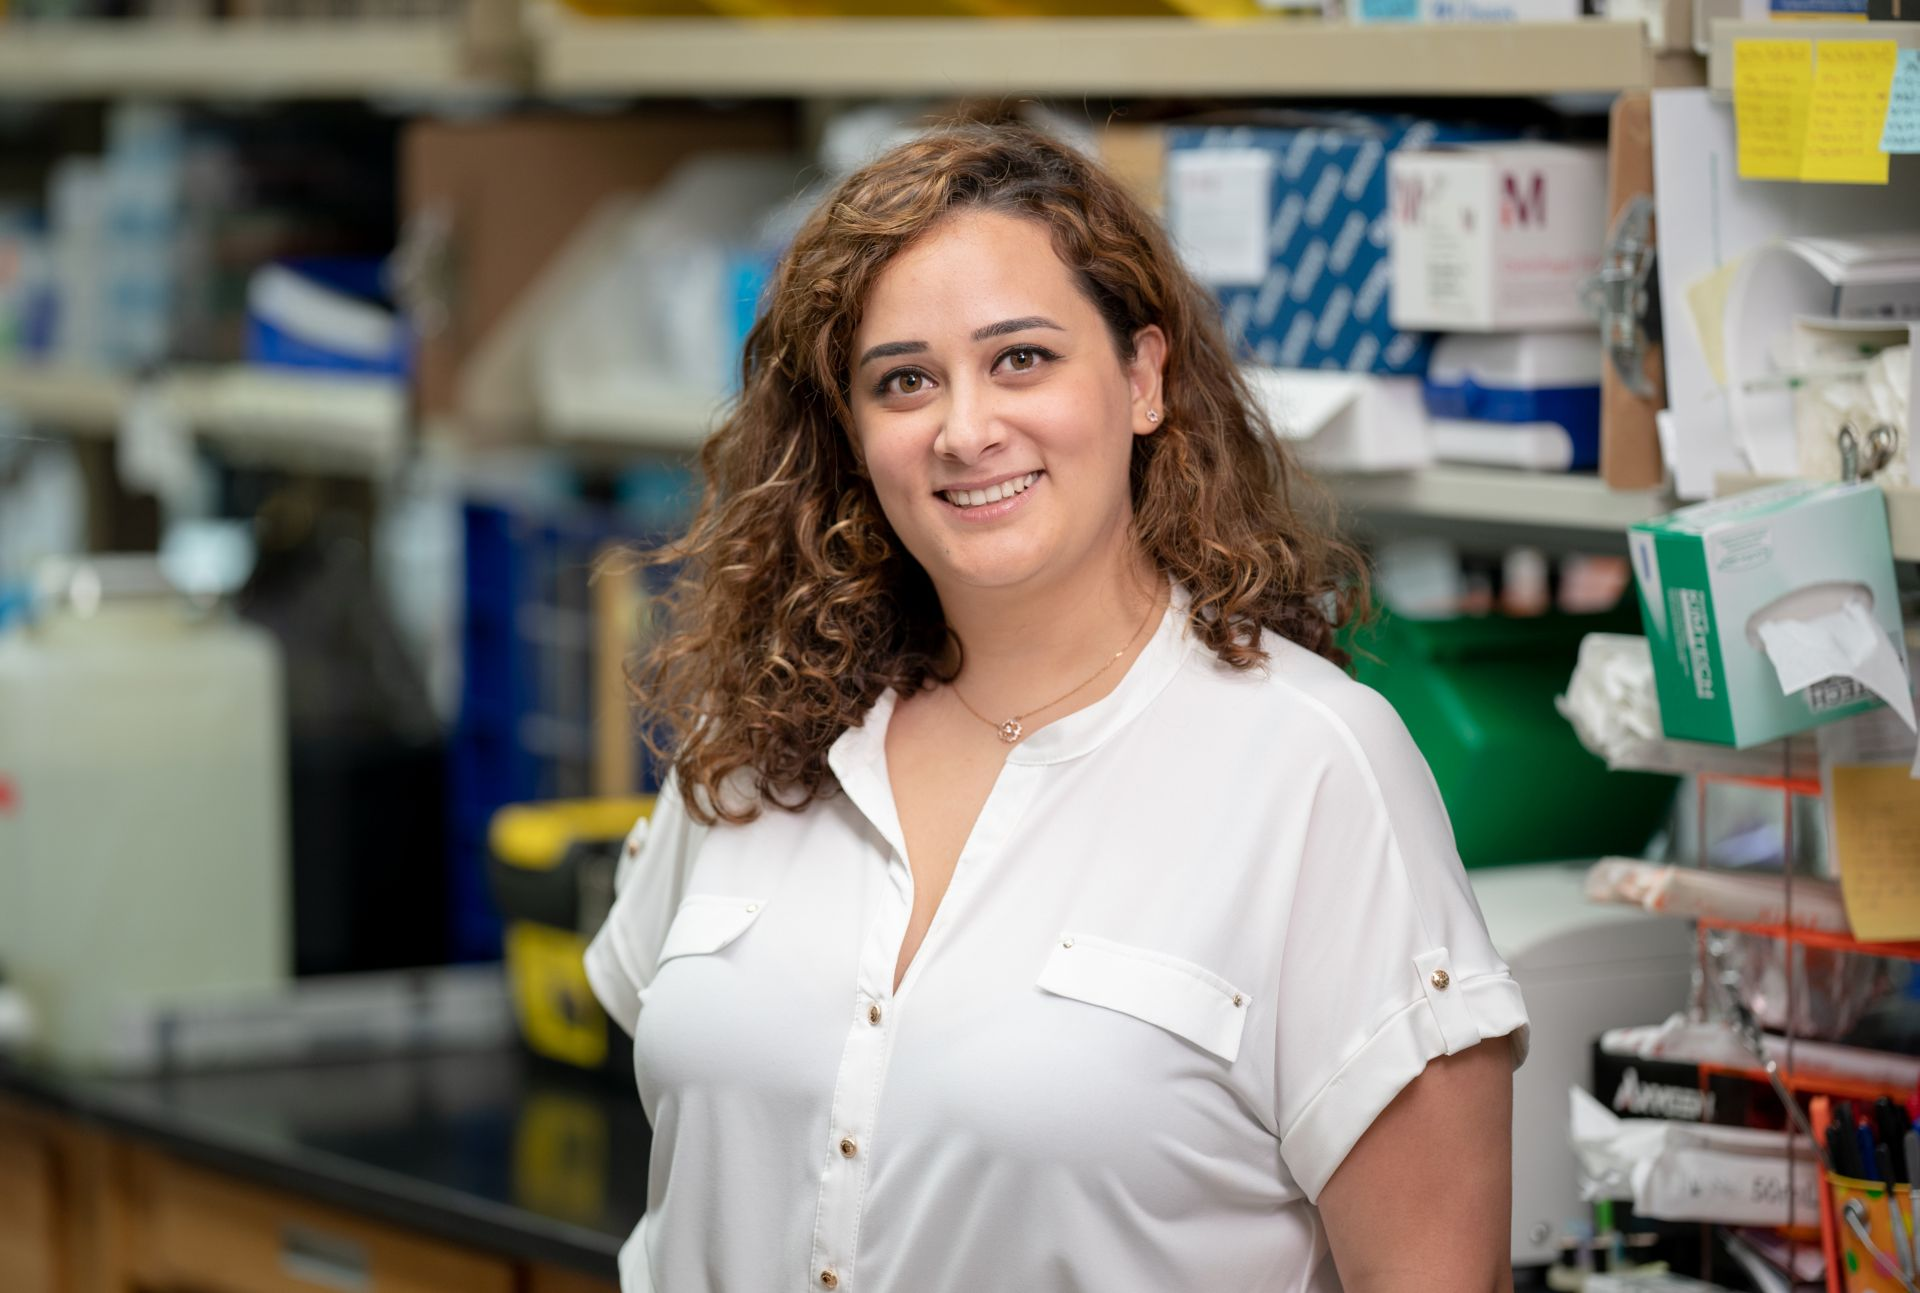 Hanane Khoury, PhD